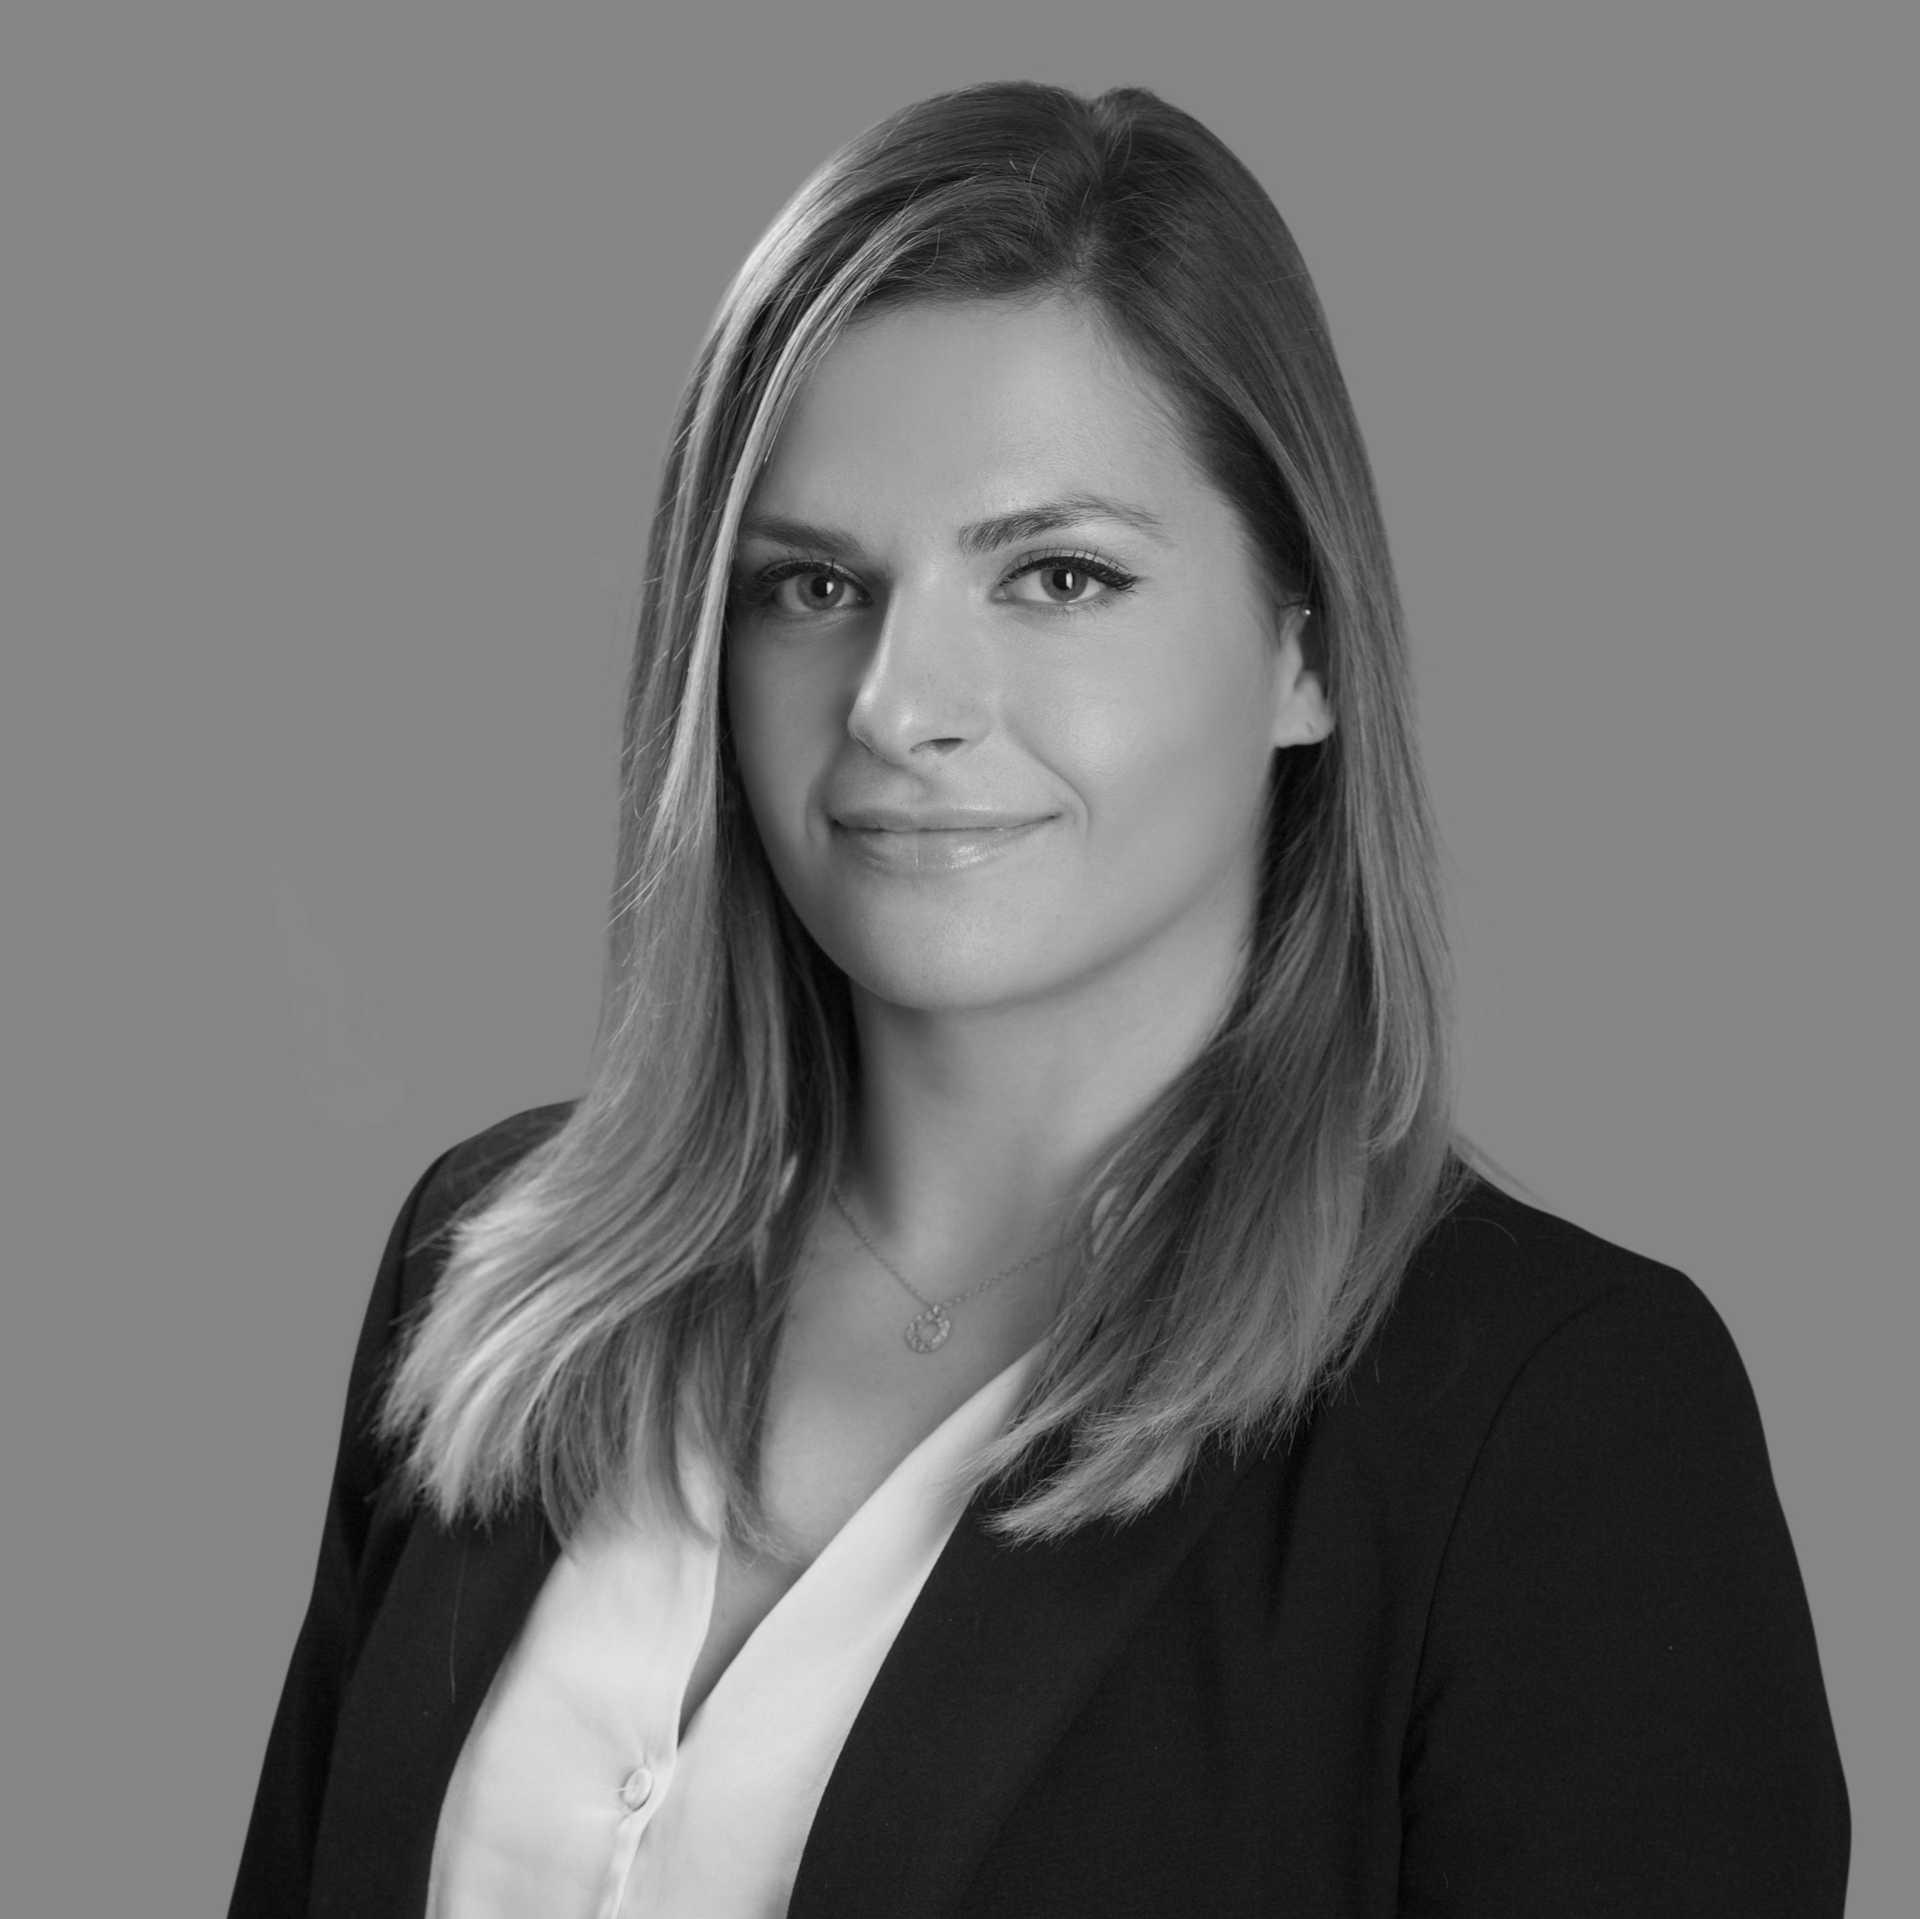 Marlin Hawk New York's Knowledge Management & Strategic Intelligence Analyst Grace Fording